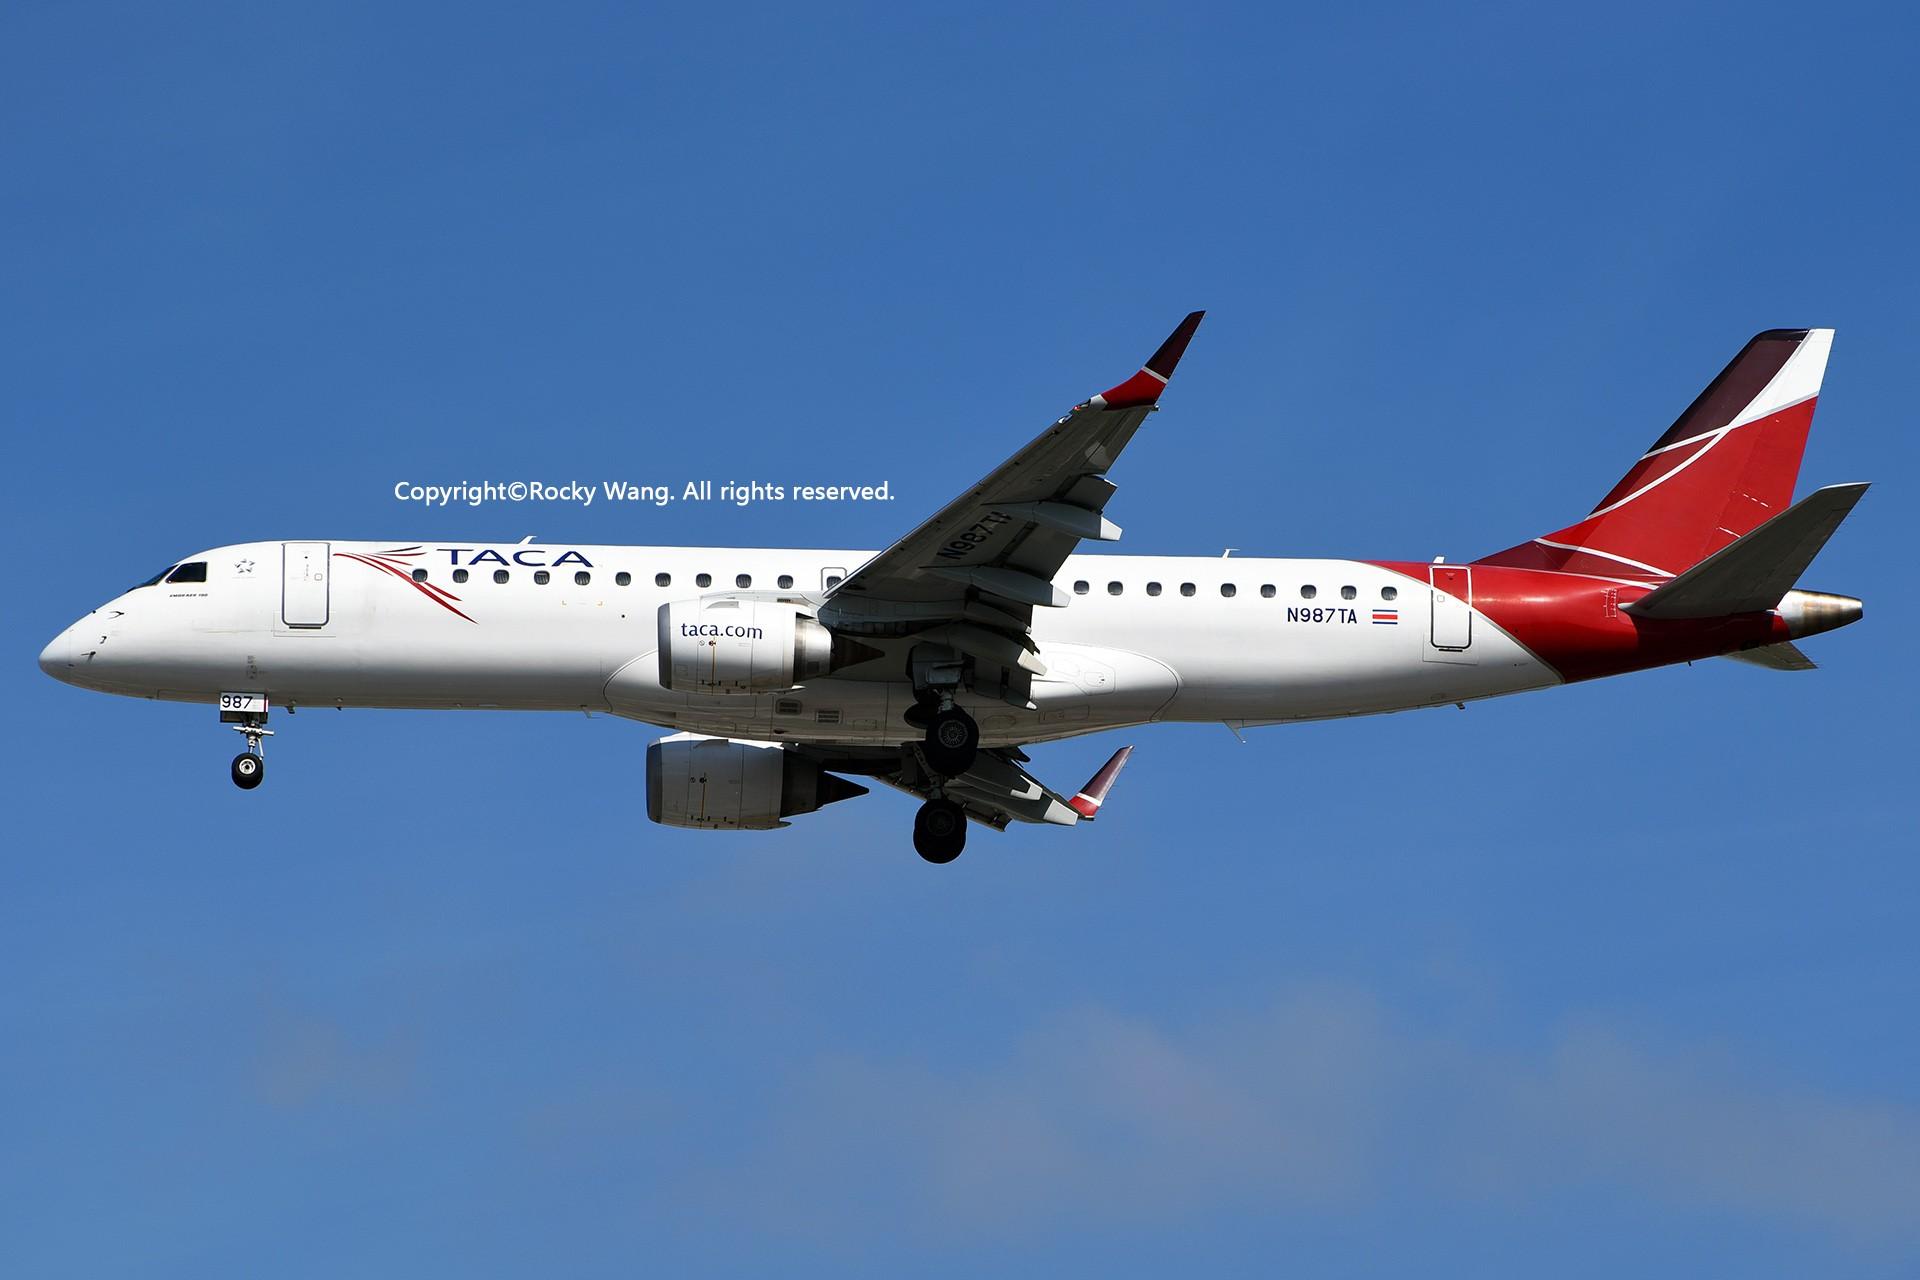 Re:[原创]KMIA 30图 EMBRAER 190-100IGW N987TA Miami Int'l Airport